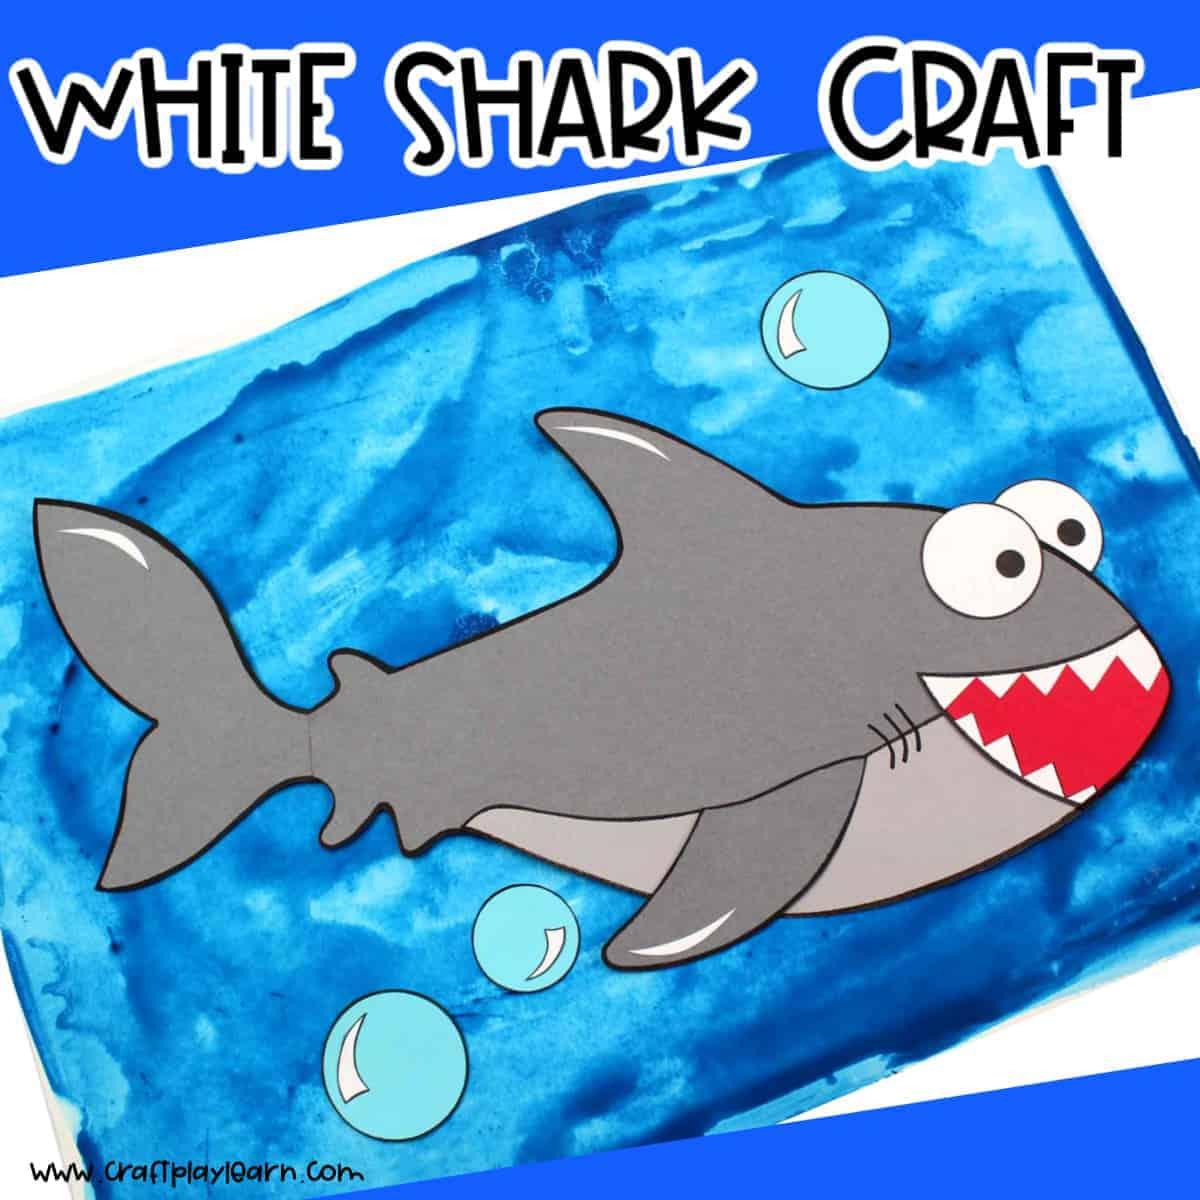 Great White Shark Craft For Kids